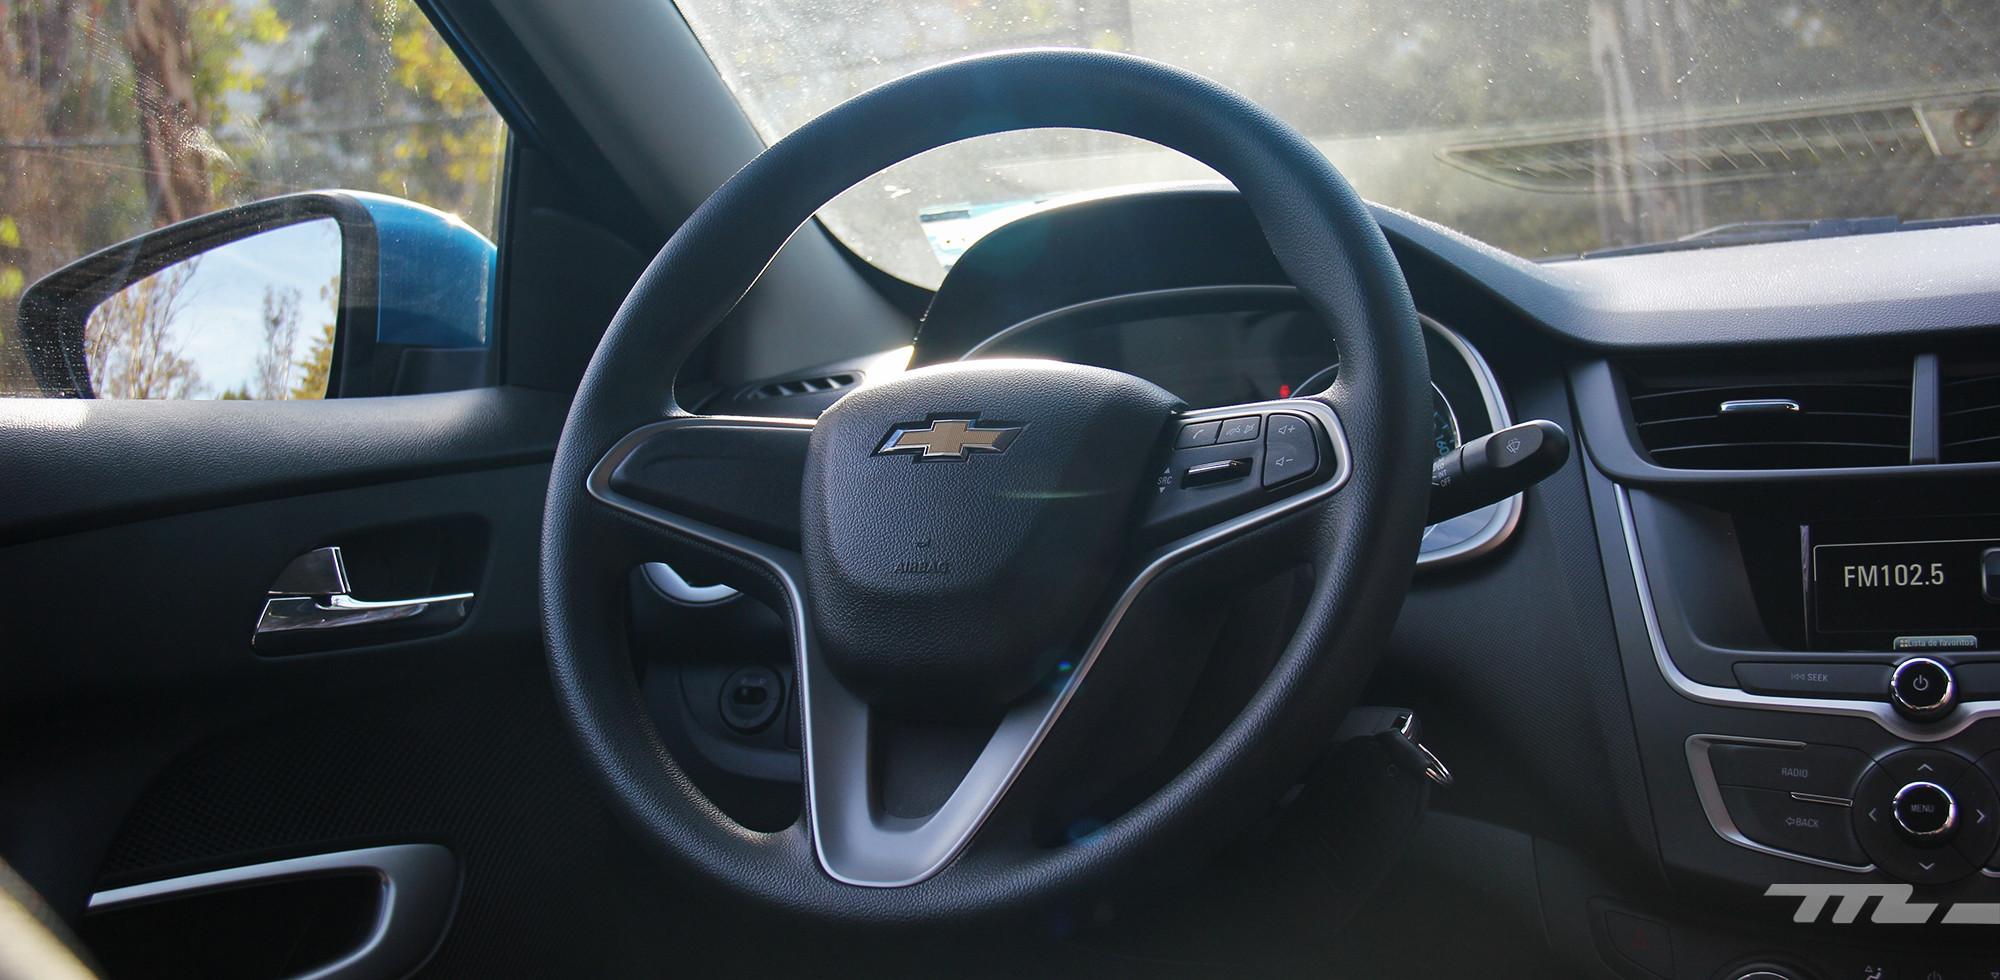 Foto de Chevrolet Aveo 2018 (prueba) (9/11)